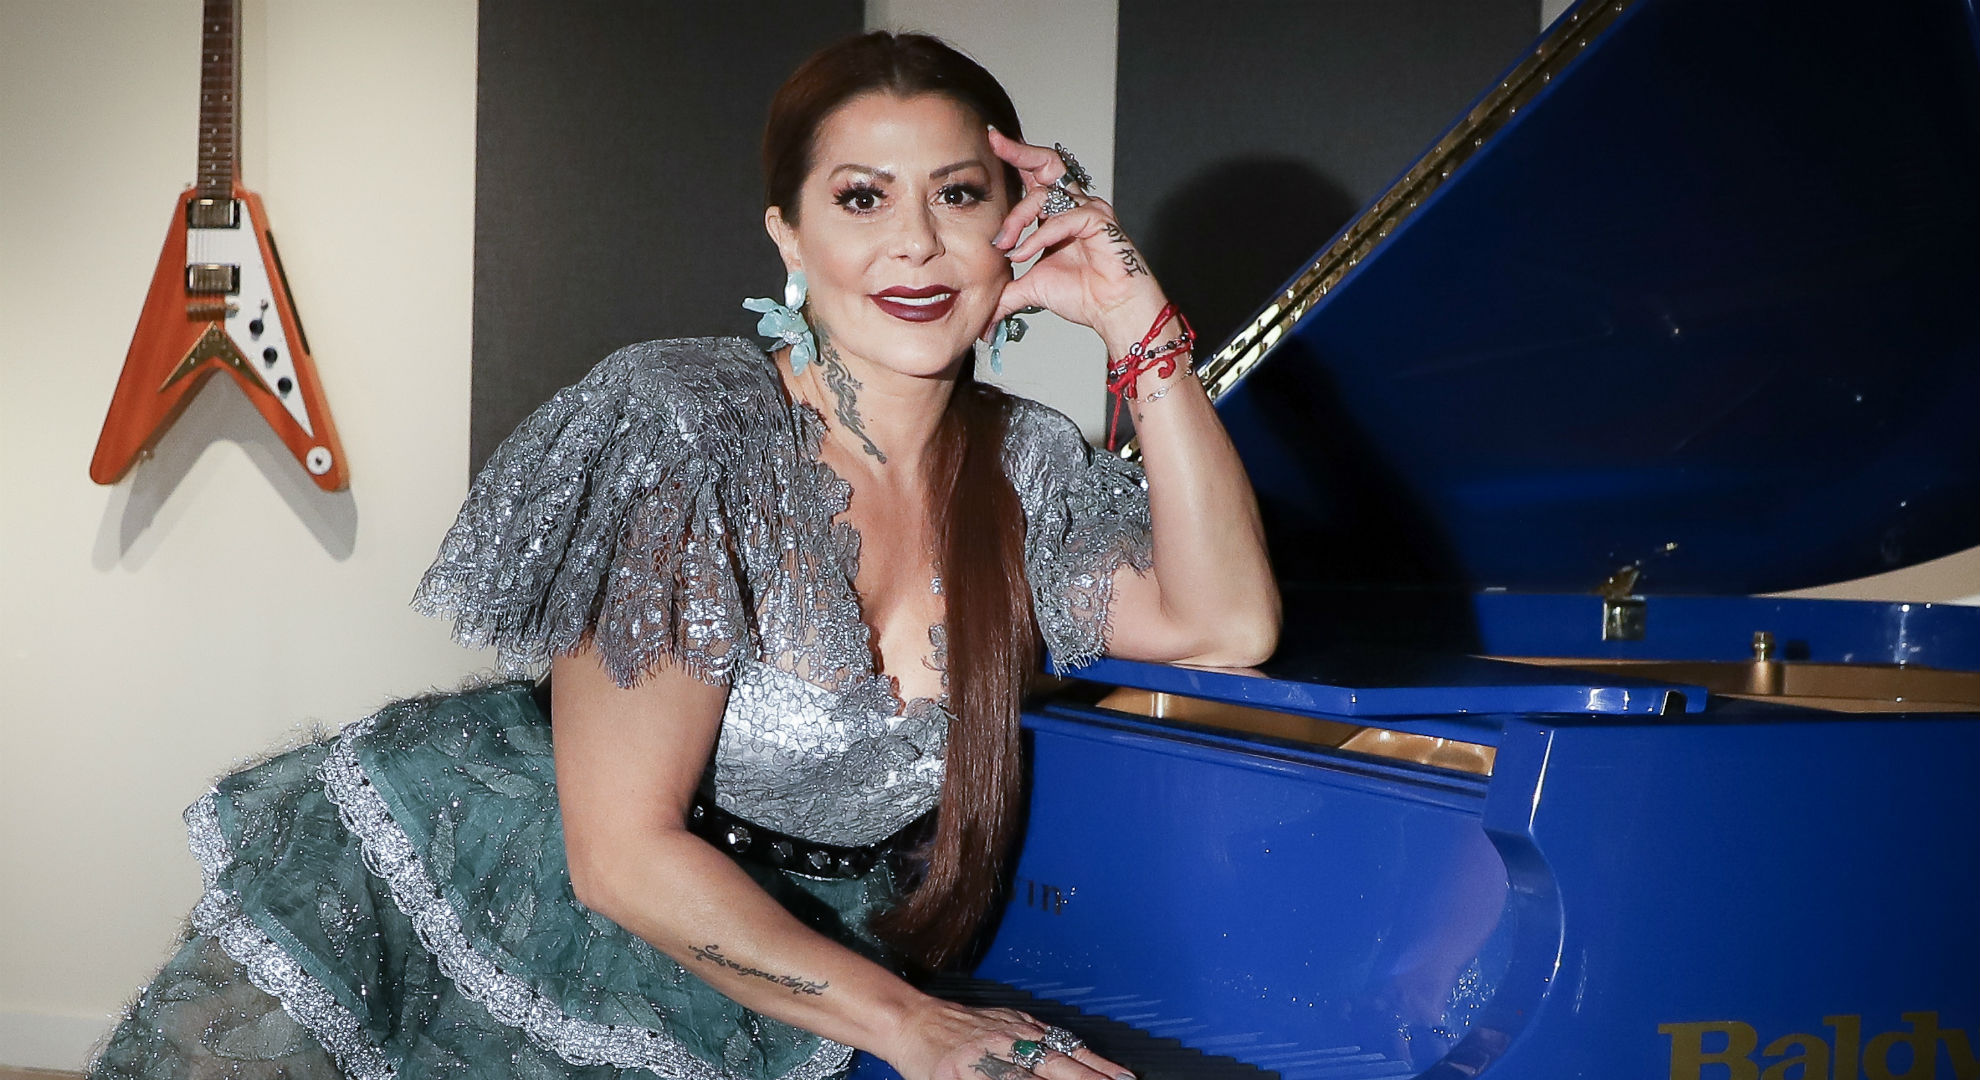 Alejandra guzman 2019